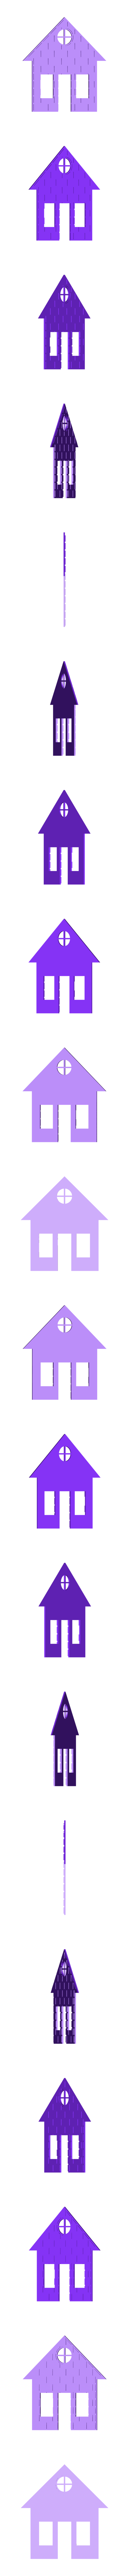 Side x2 Mirror.stl Download STL file Brick house • 3D printer template, Fira